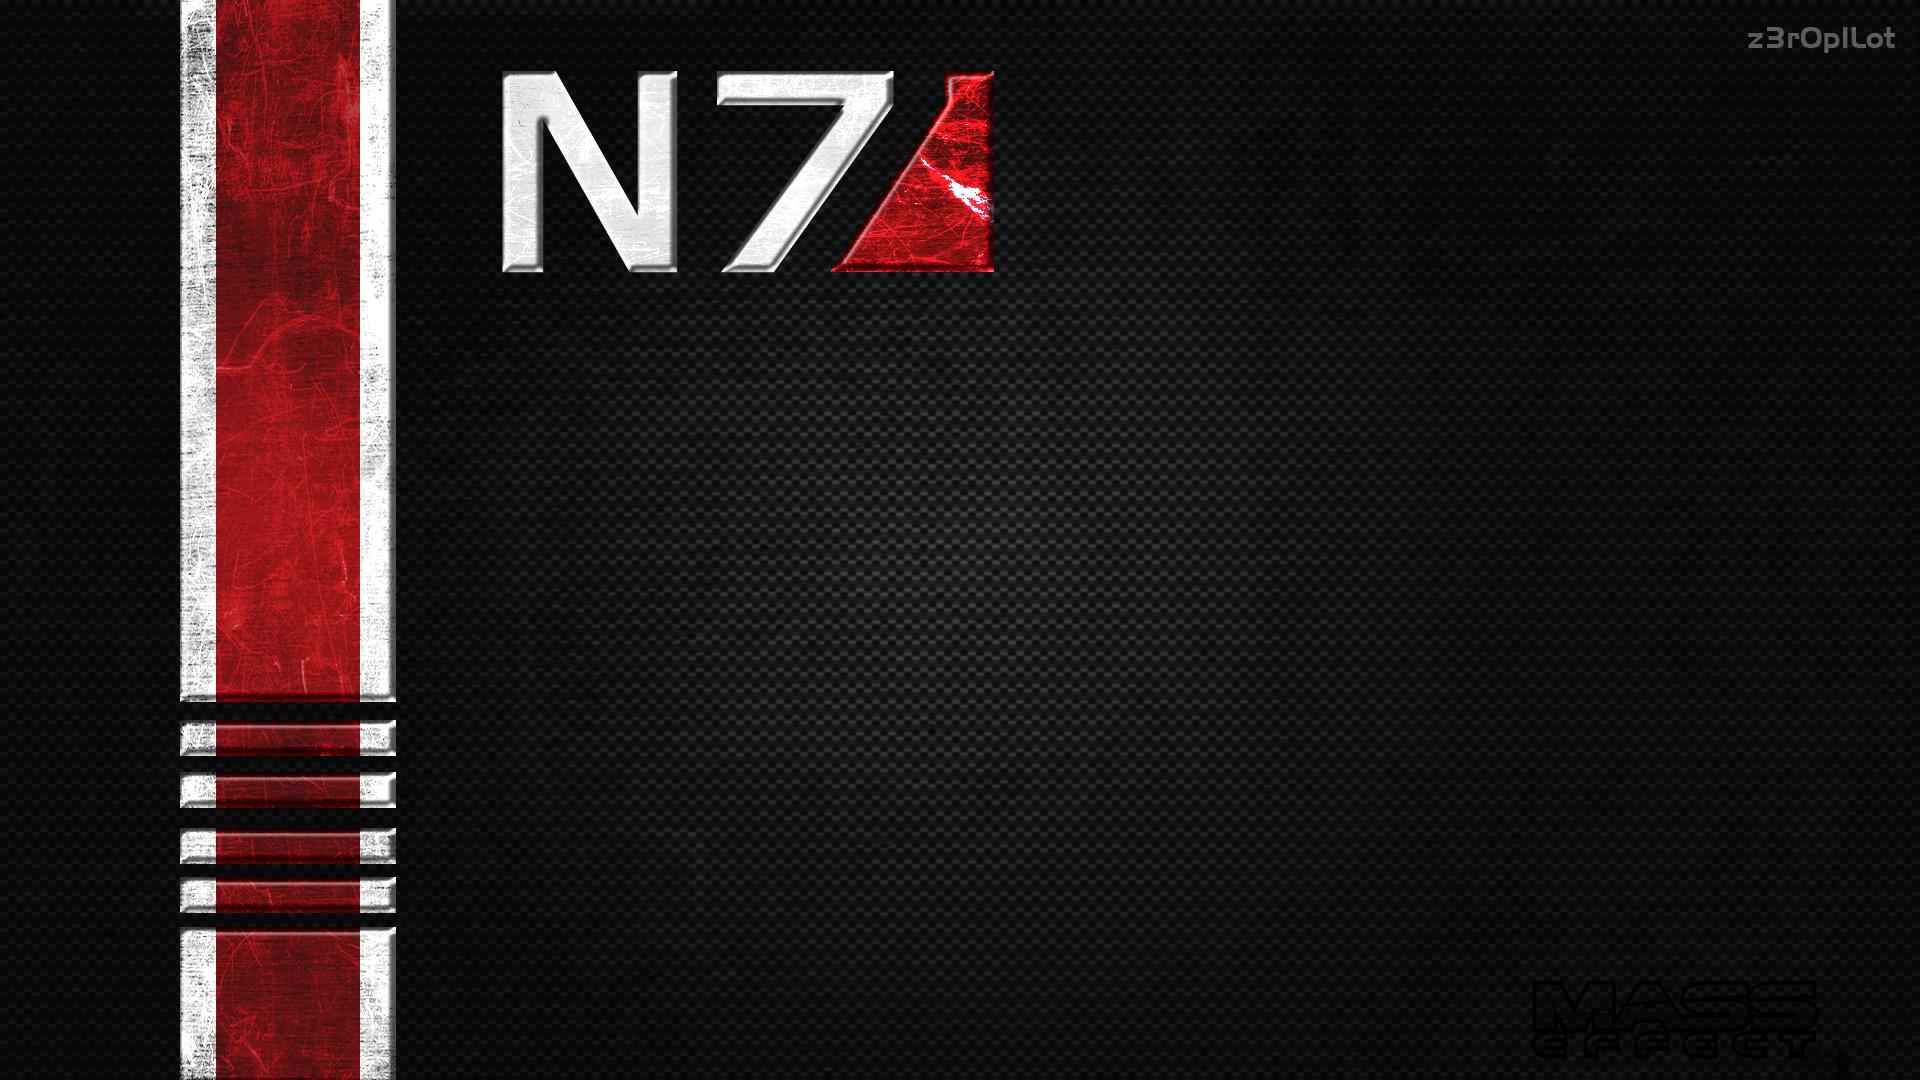 Mass Effect 3 N7 Wallpaper - WallpaperSafari